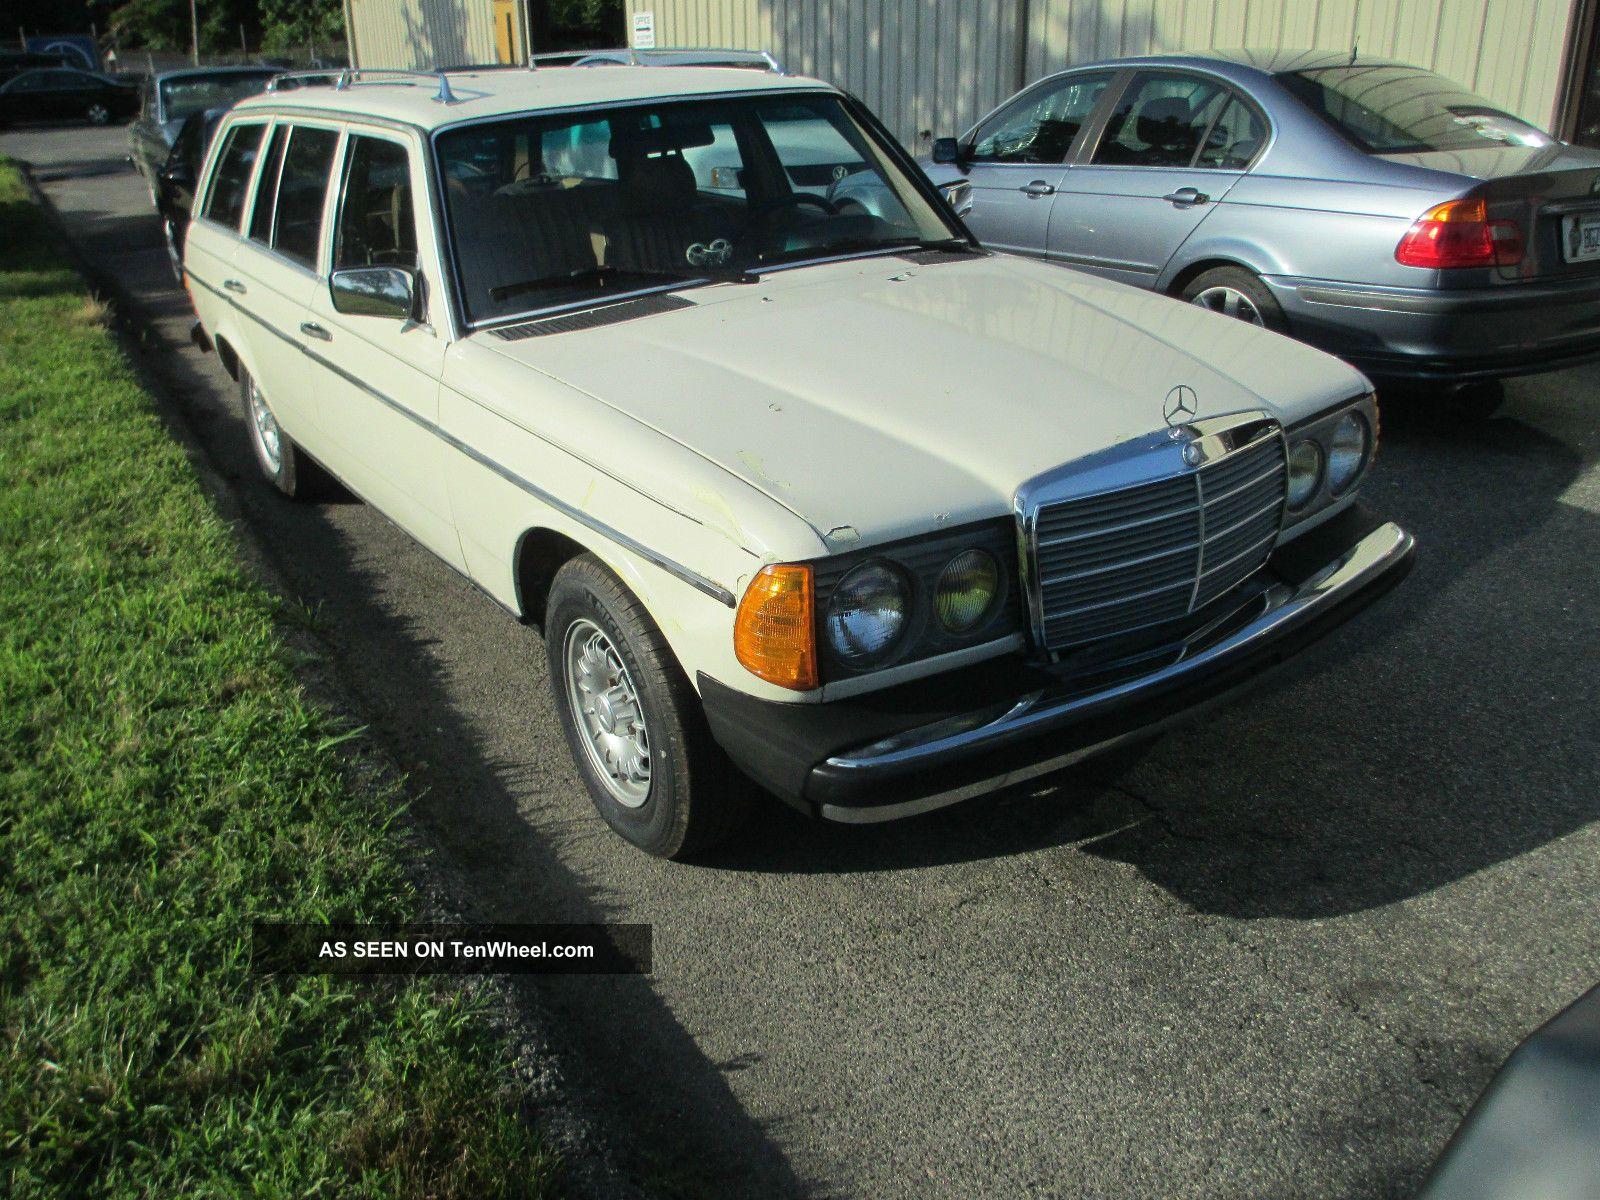 1983 mercedes 300td grease car waste cooking oil for 1983 mercedes benz 300td